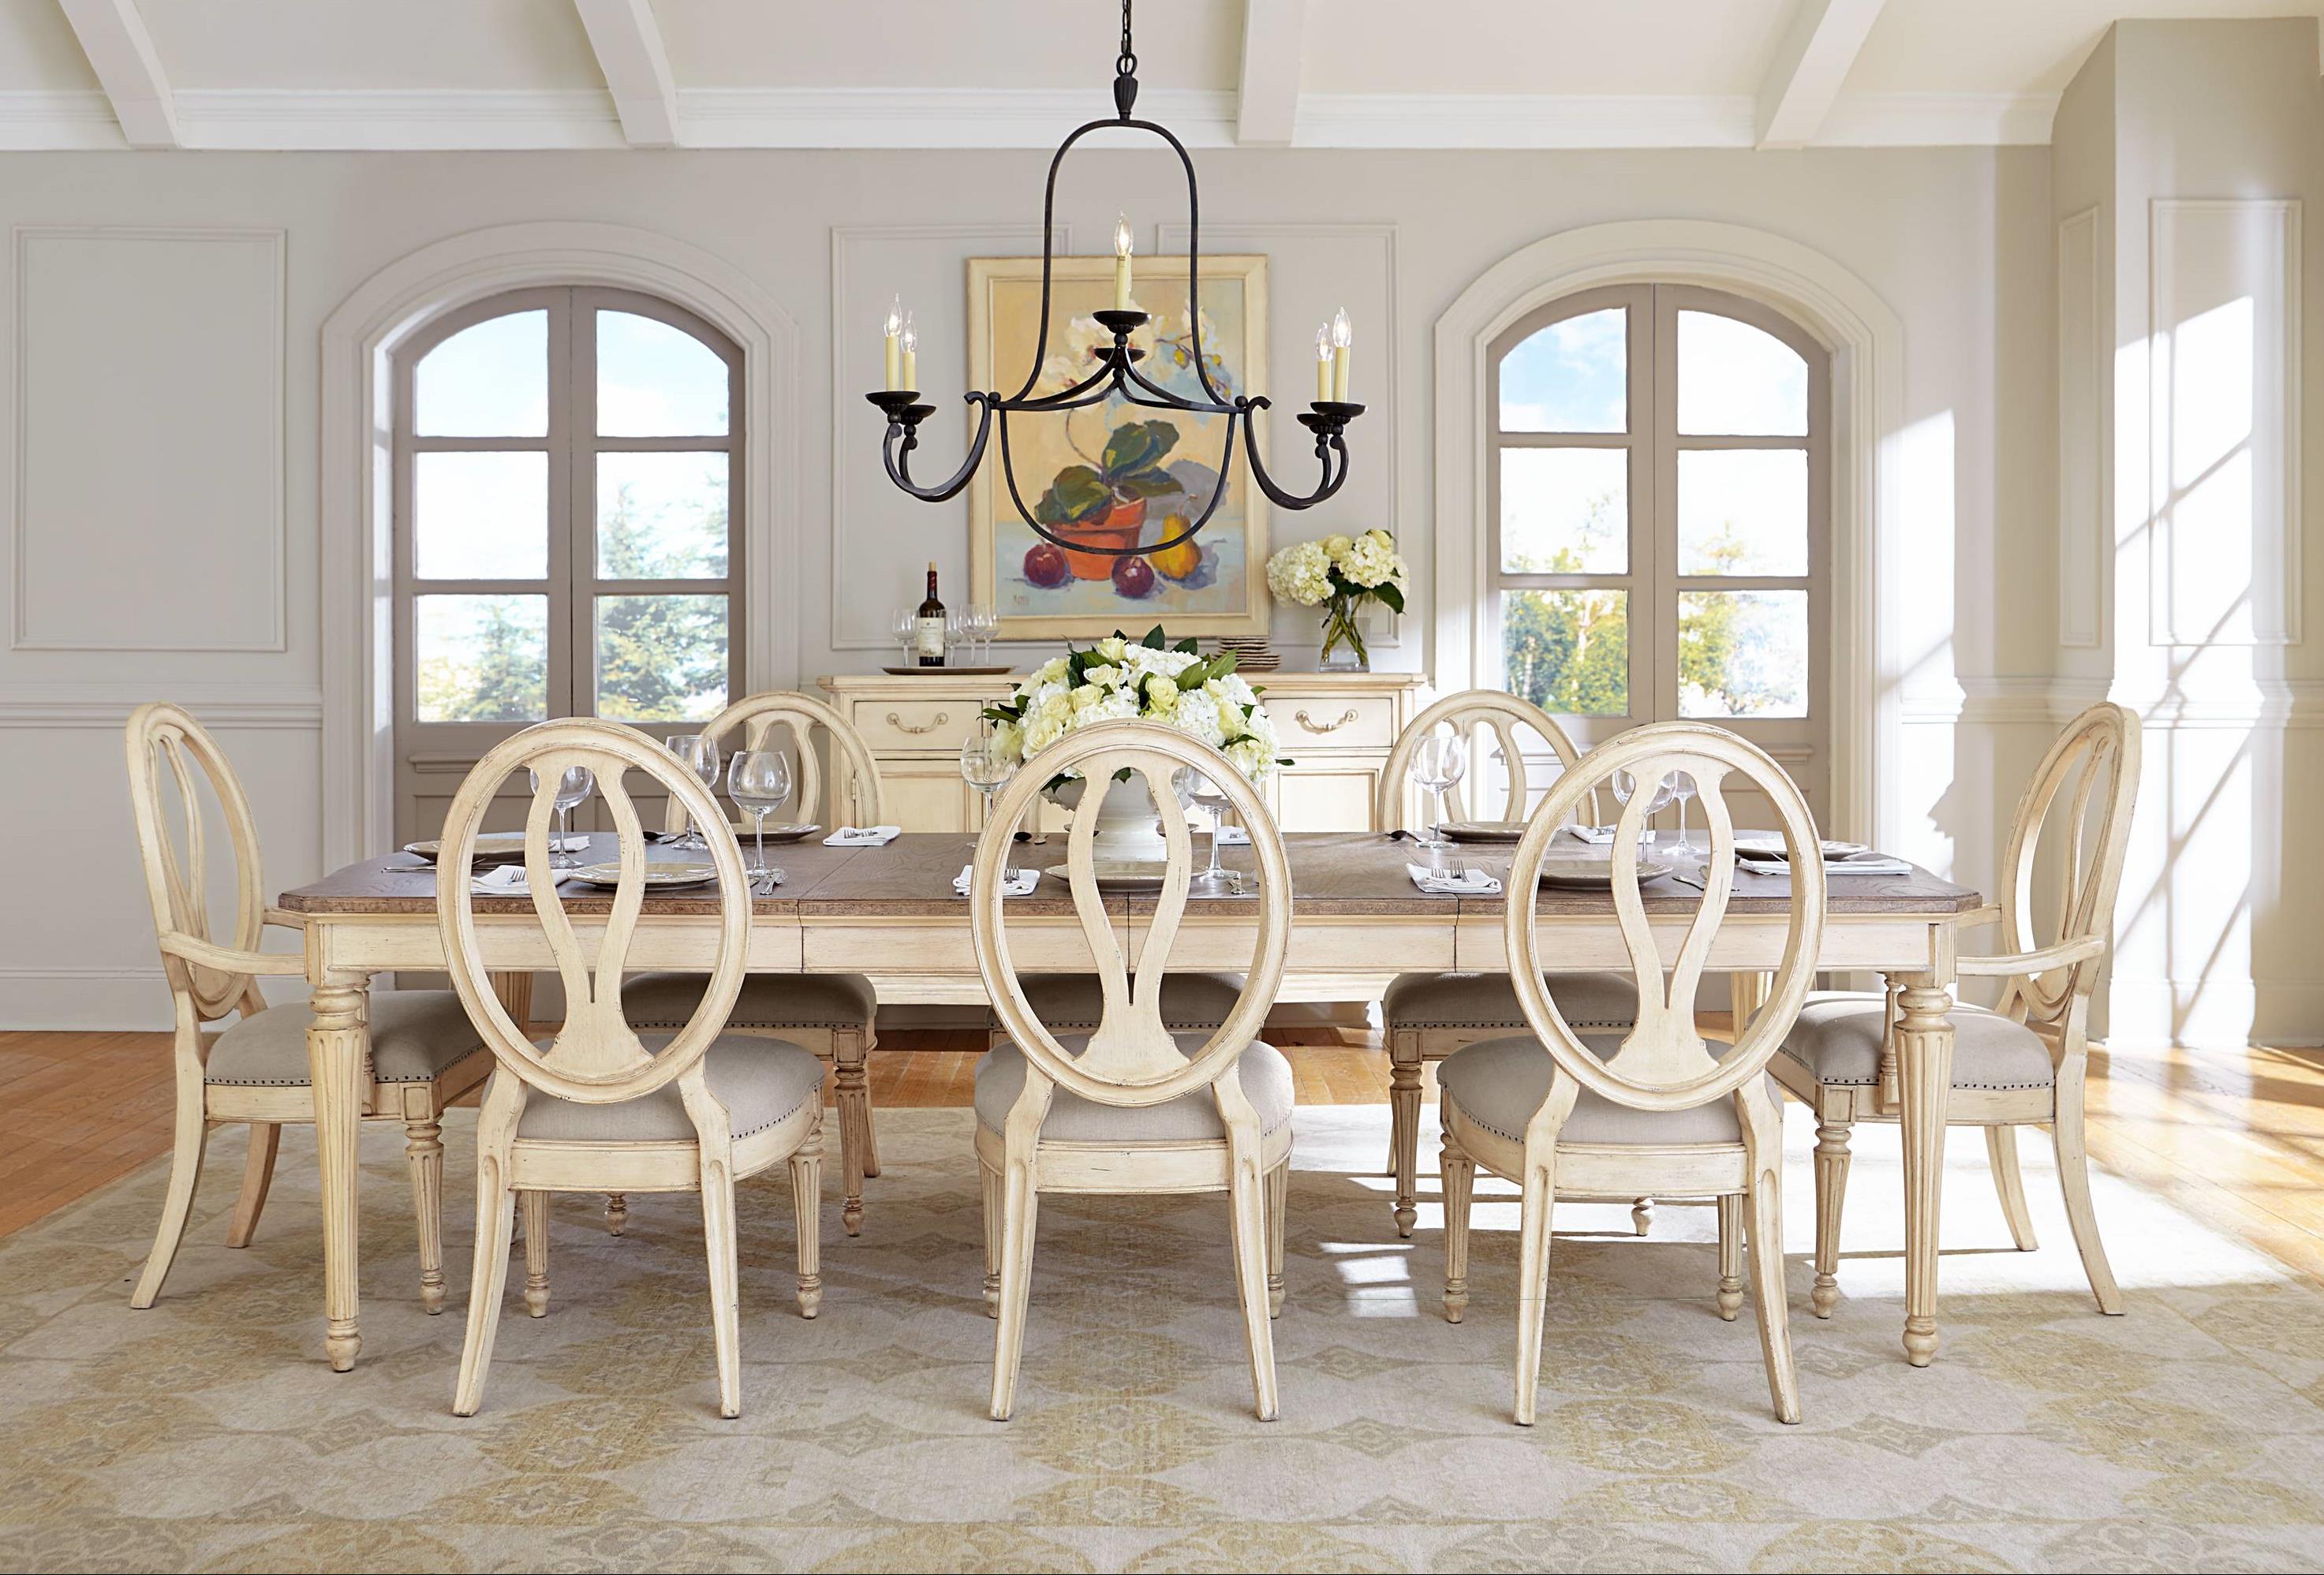 Stanley Furniture European Cottage Formal Dining Room Group - Item Number: 007-23 Dining Room Group 1